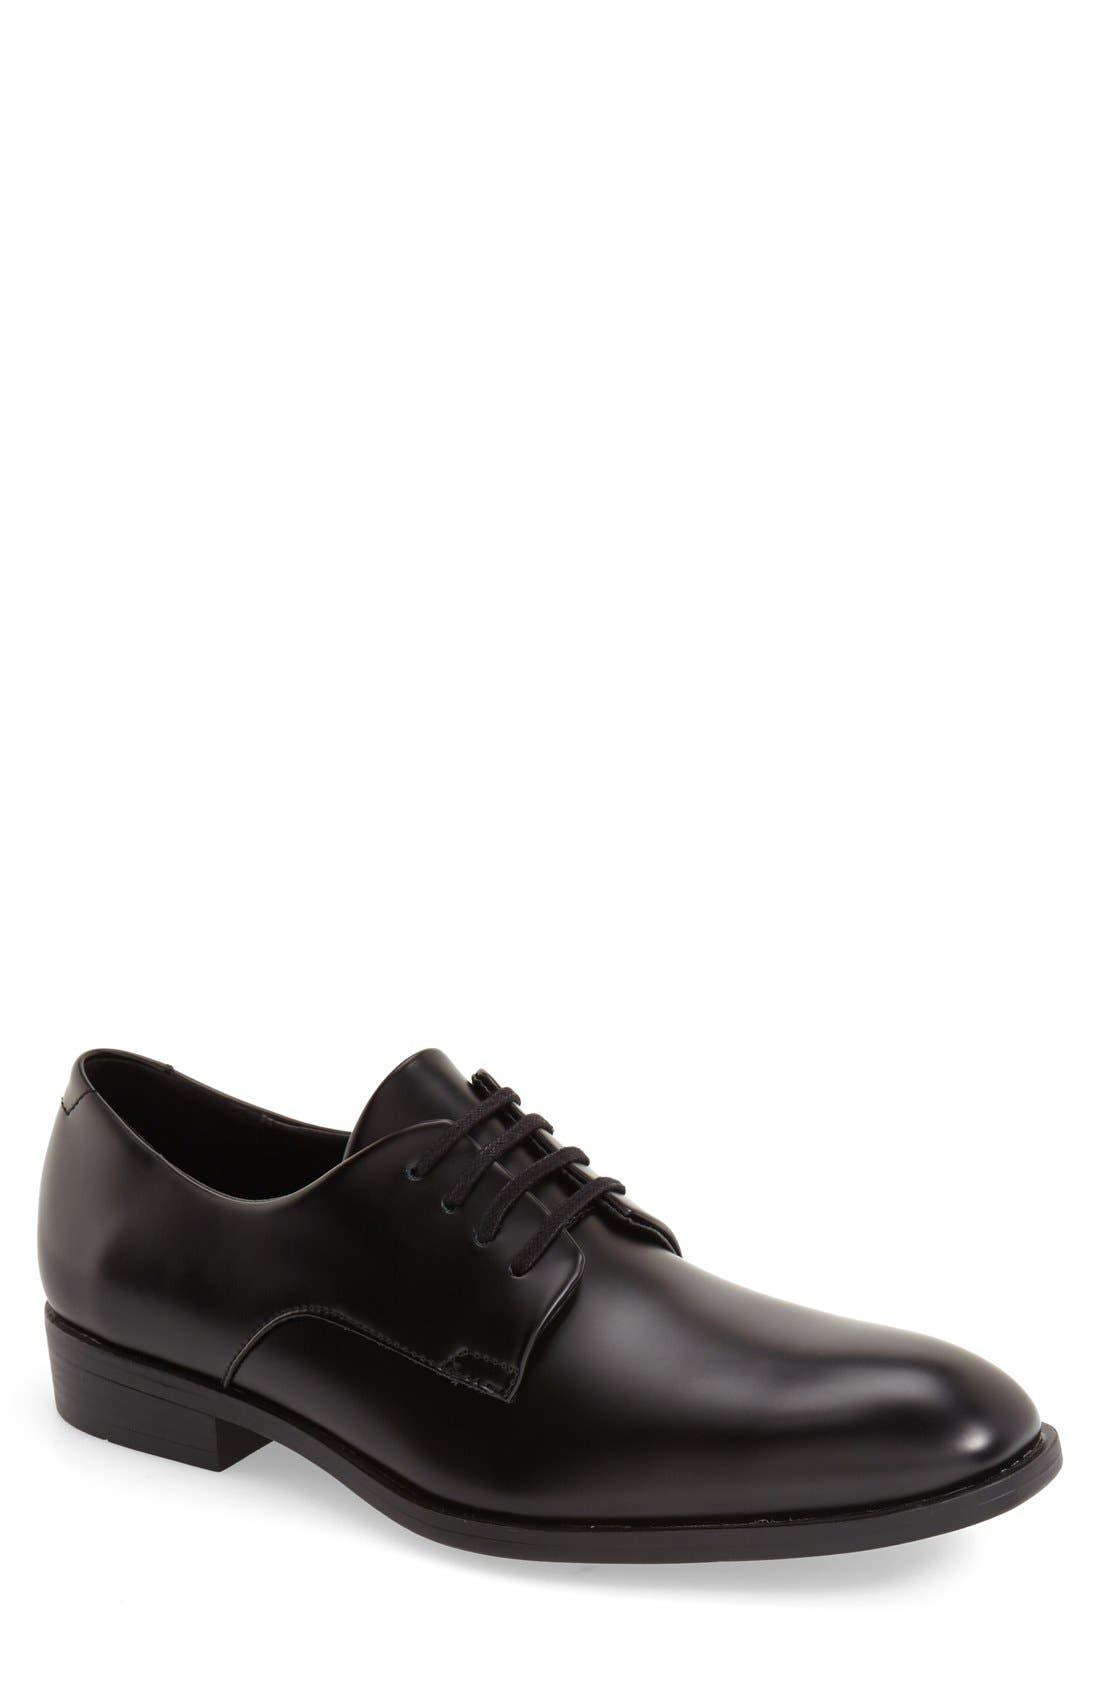 'Dorrel' Plain Toe Derby,                             Main thumbnail 1, color,                             Black